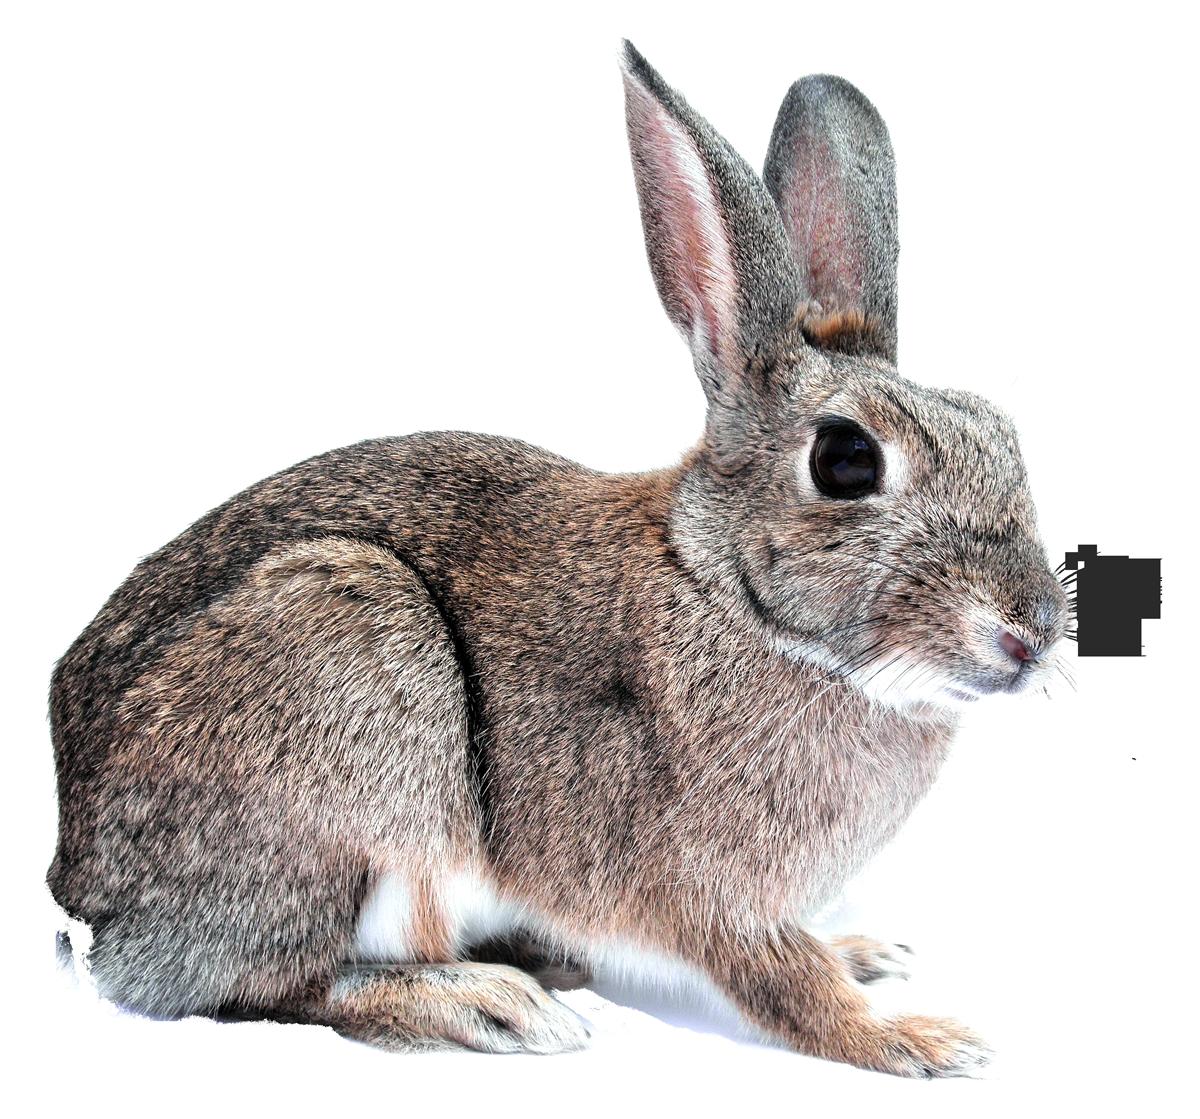 Pawprint clipart bunny. Pet png images pngpix